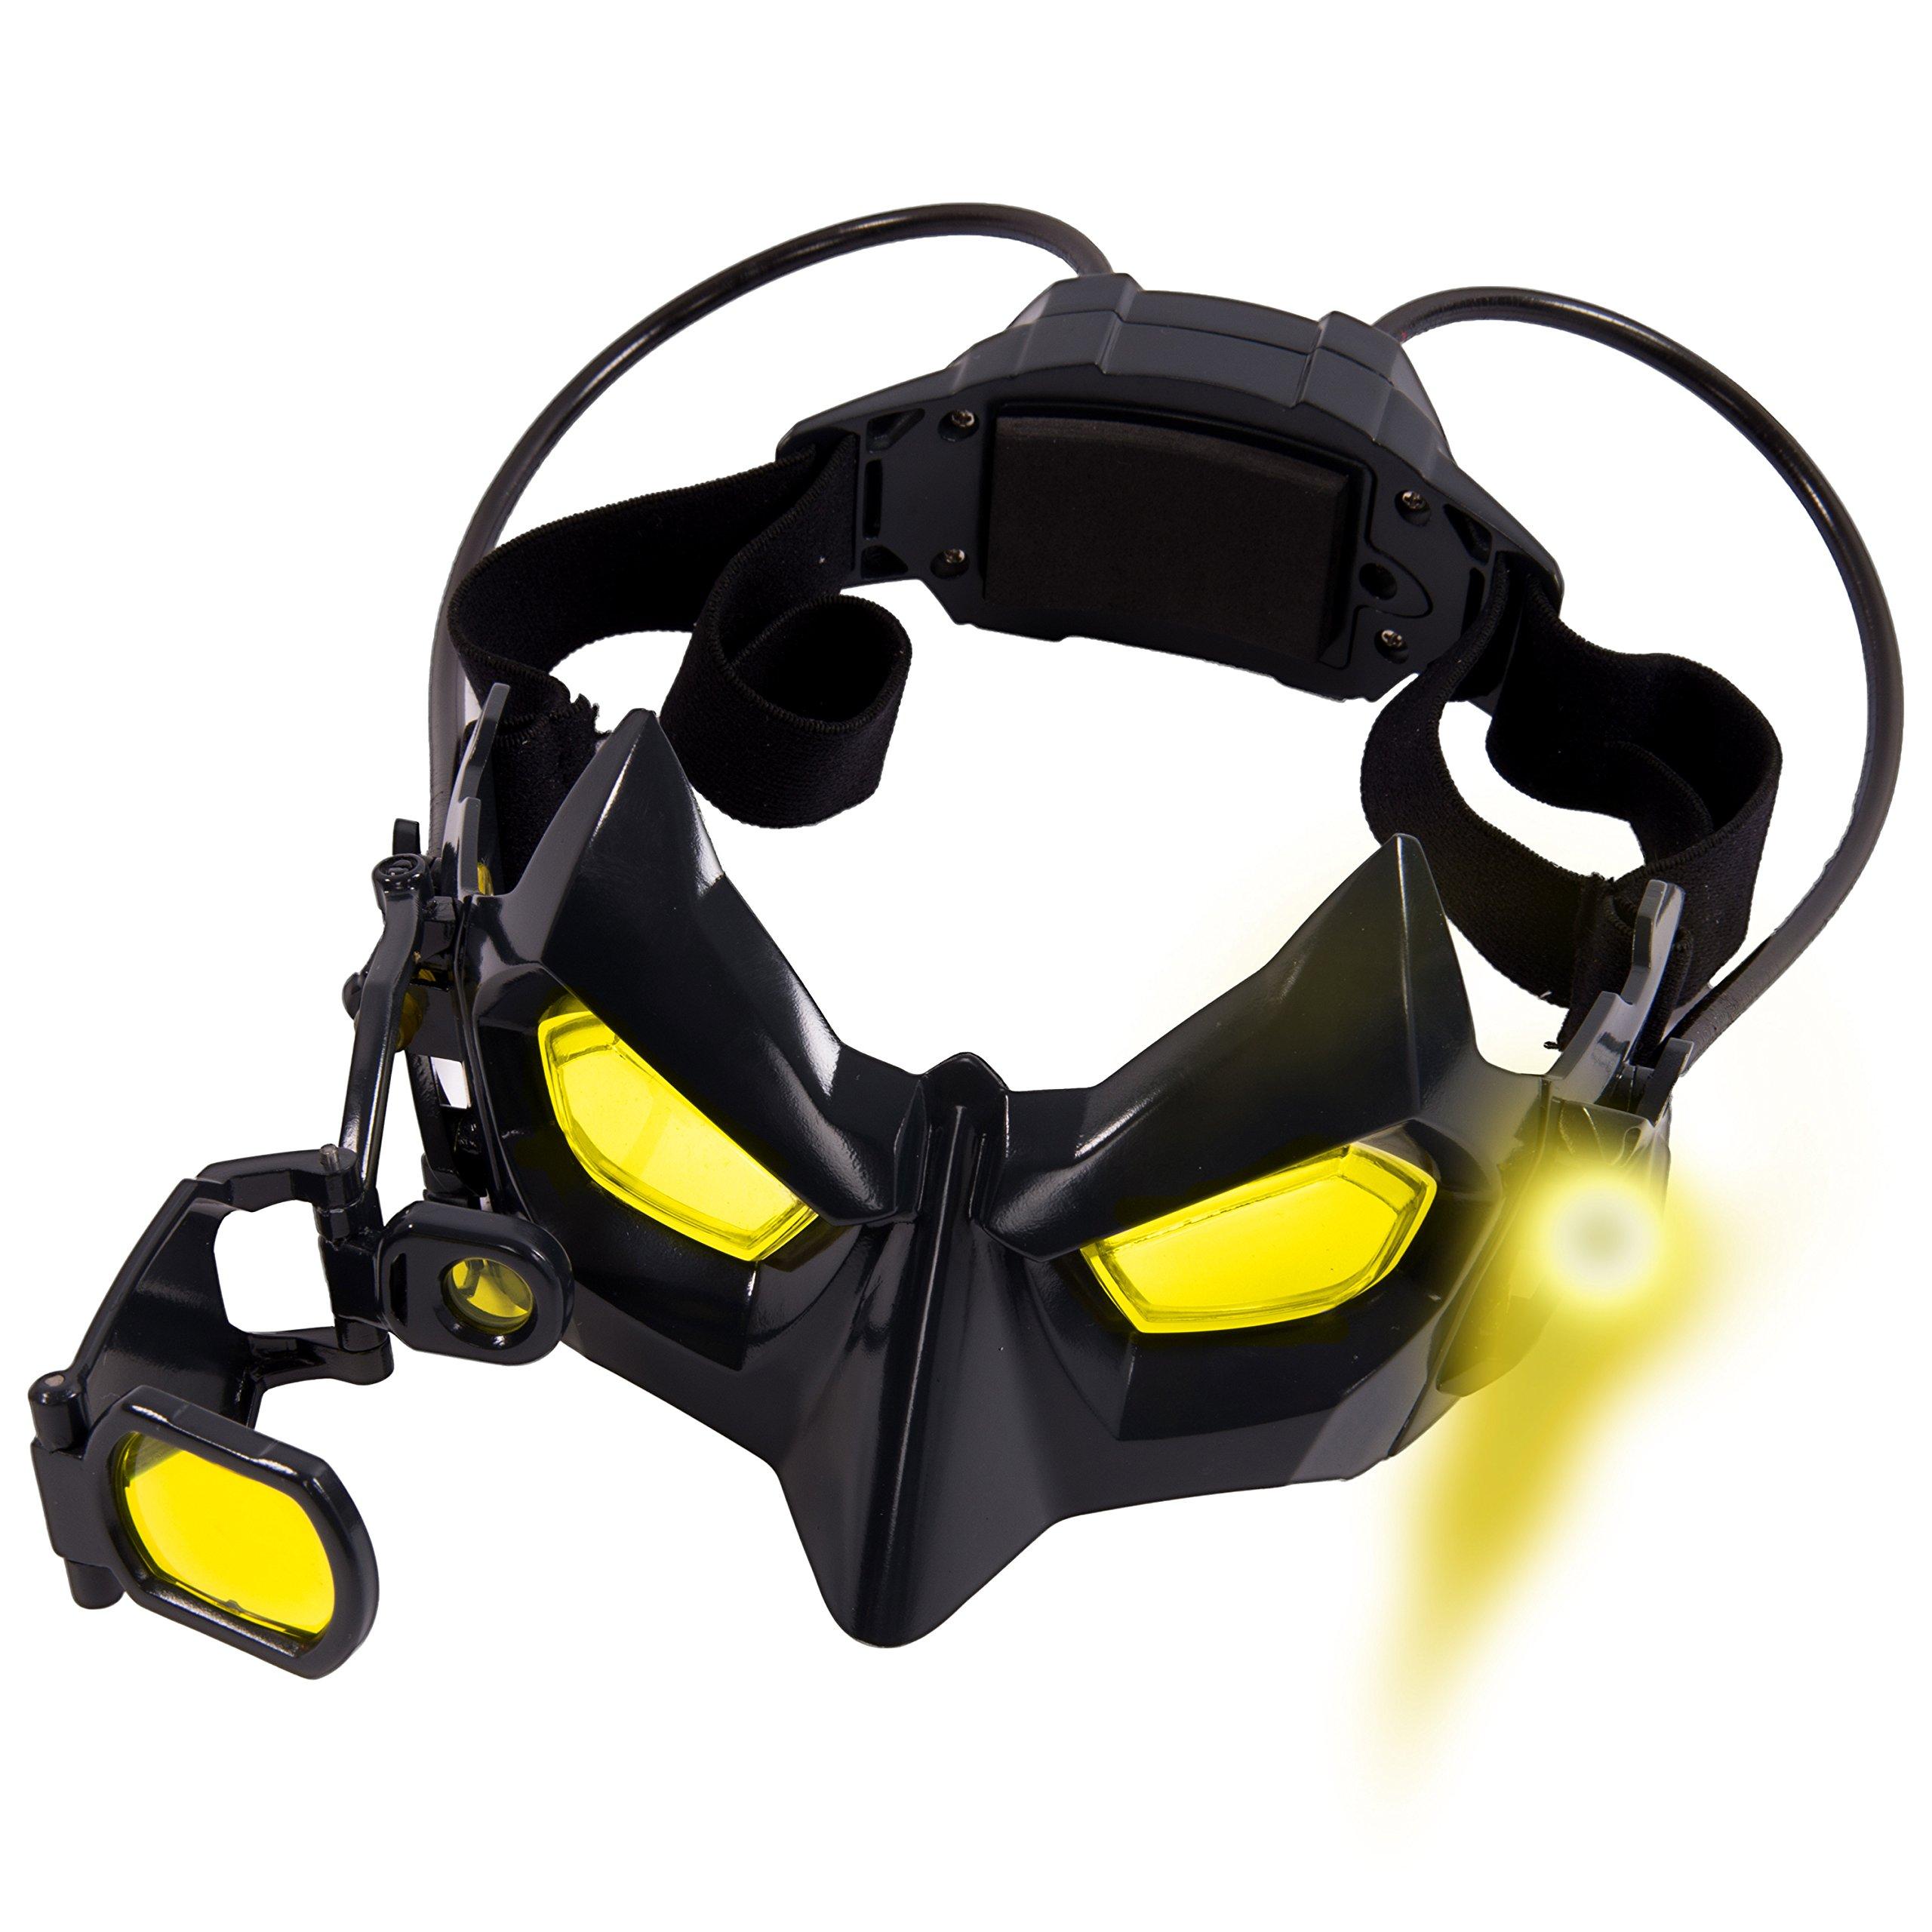 Spy Gear - Batman Night Goggles by Spy Gear (Image #4)